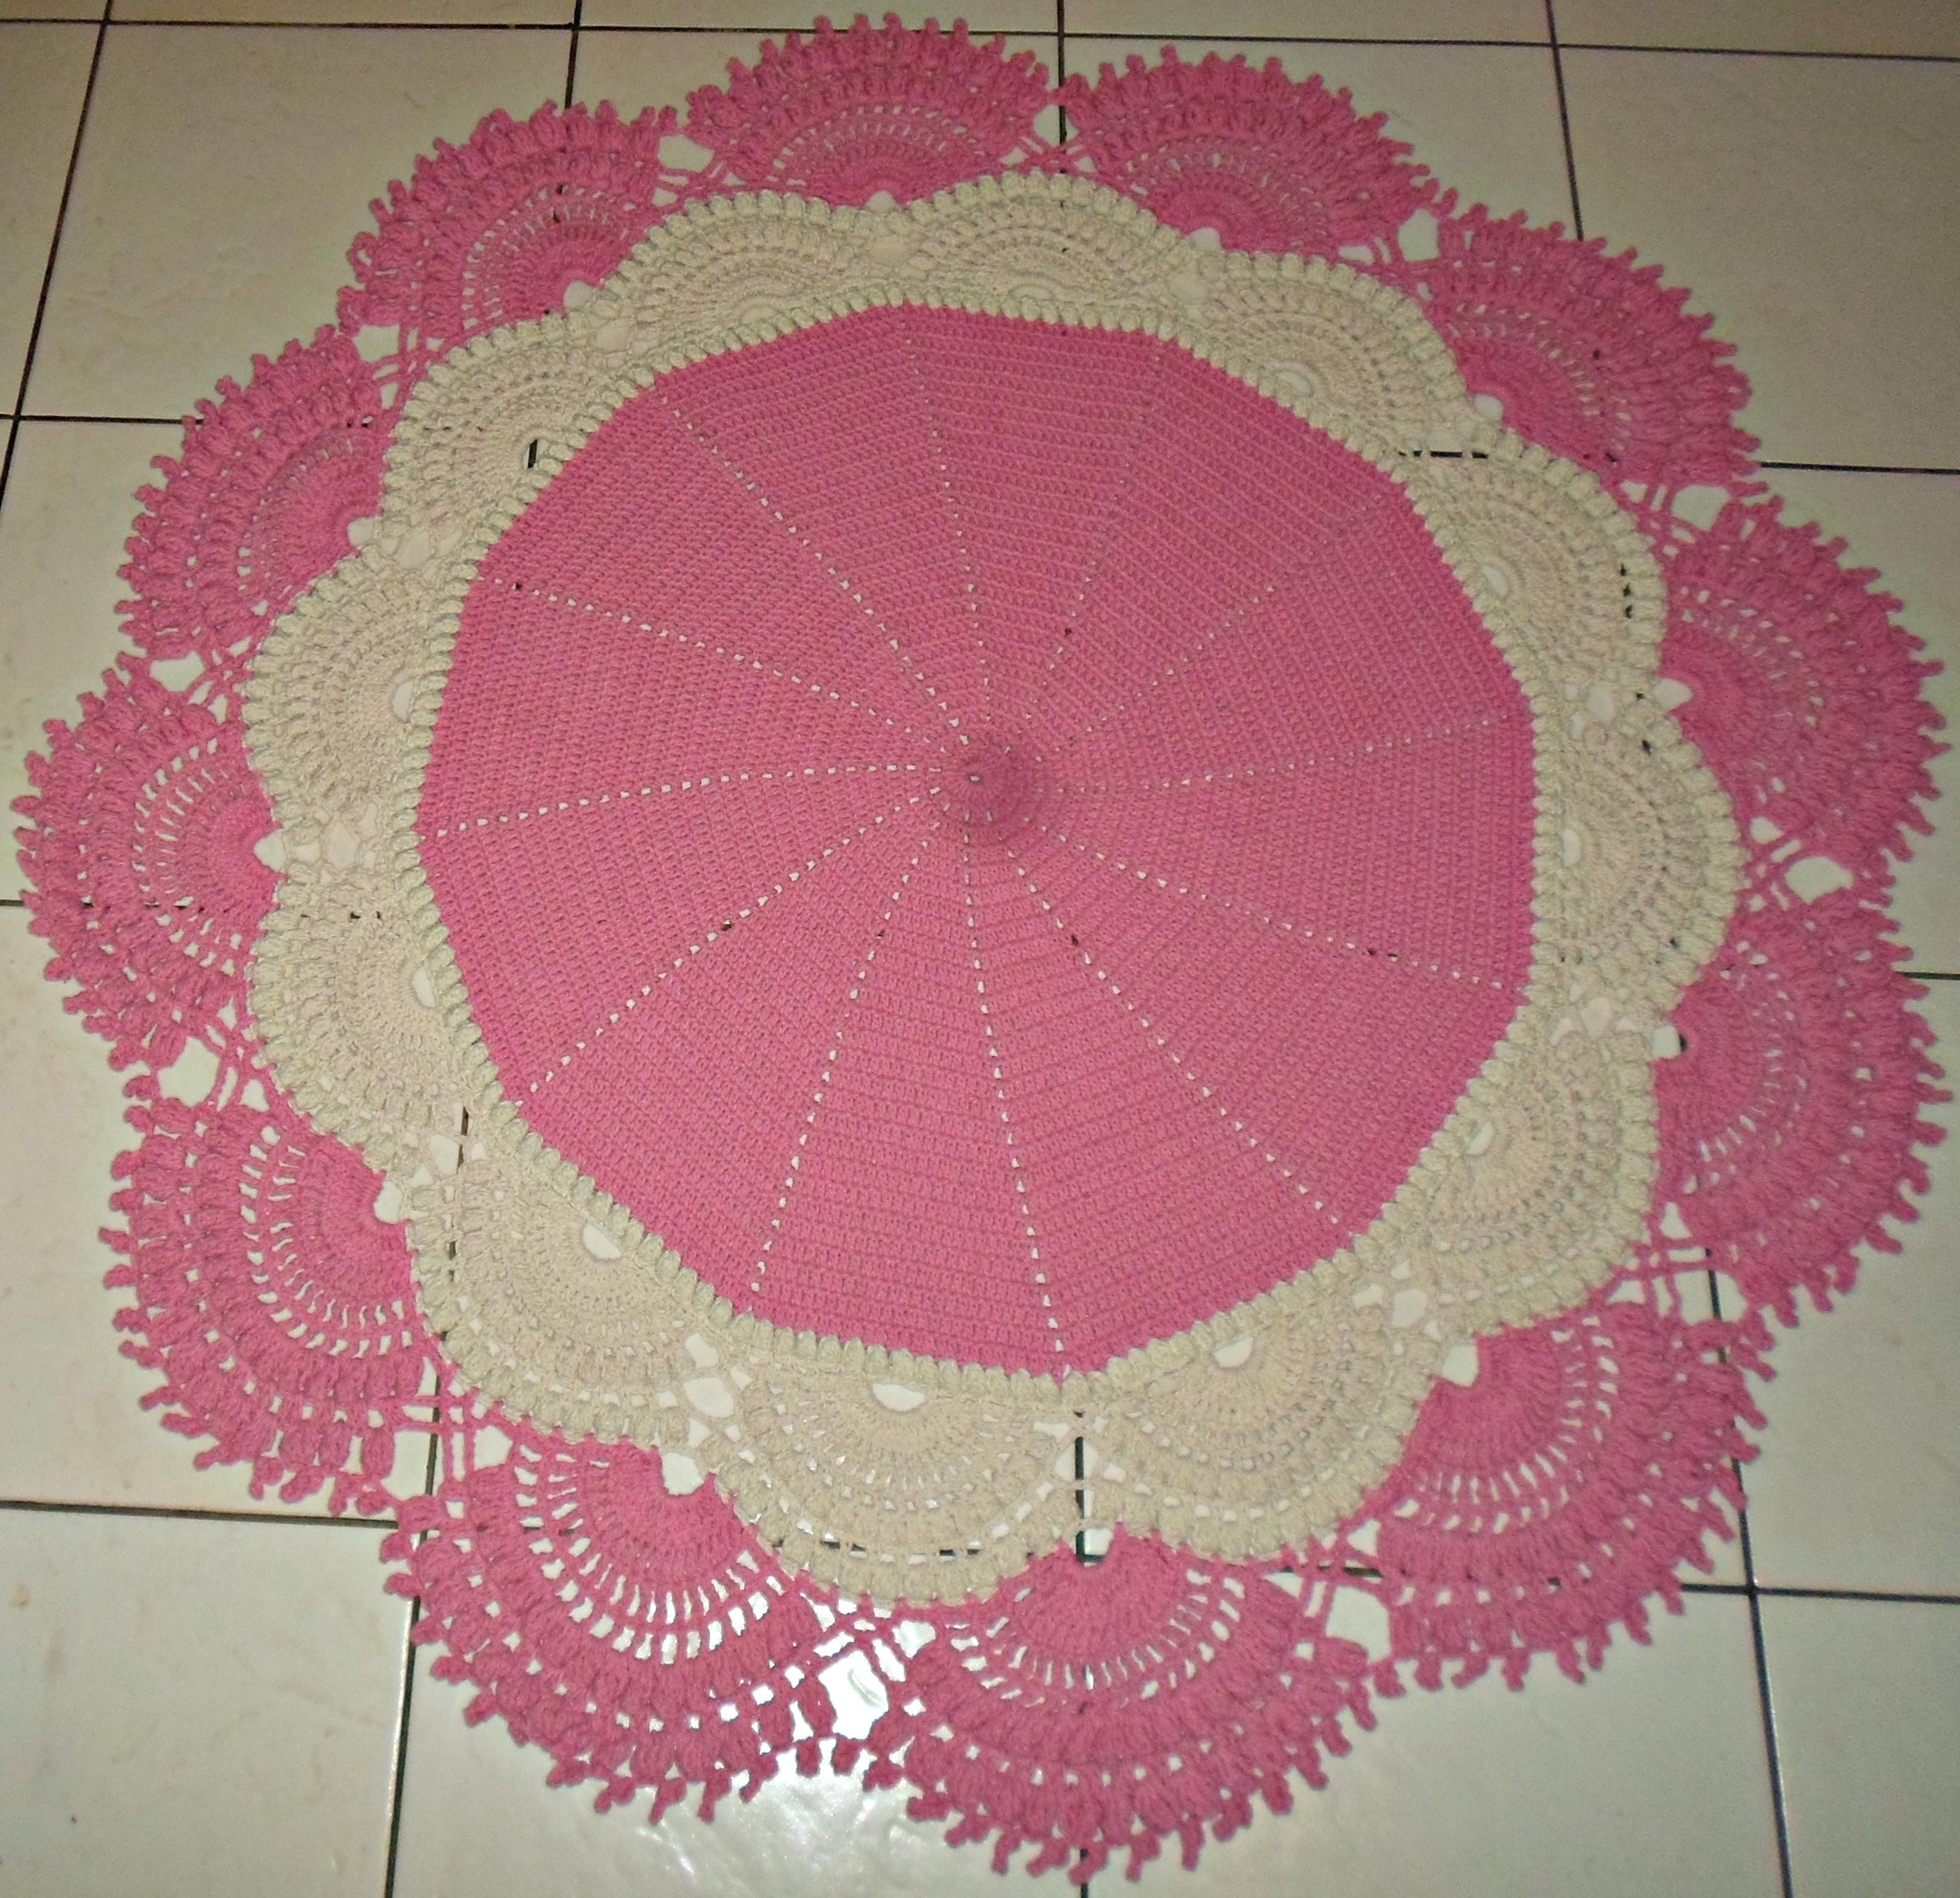 Tapete De Croch Lindos Modelos Exclusivos De Barbante Veja  -> Tapete De Croche Redondo Passo A Passo